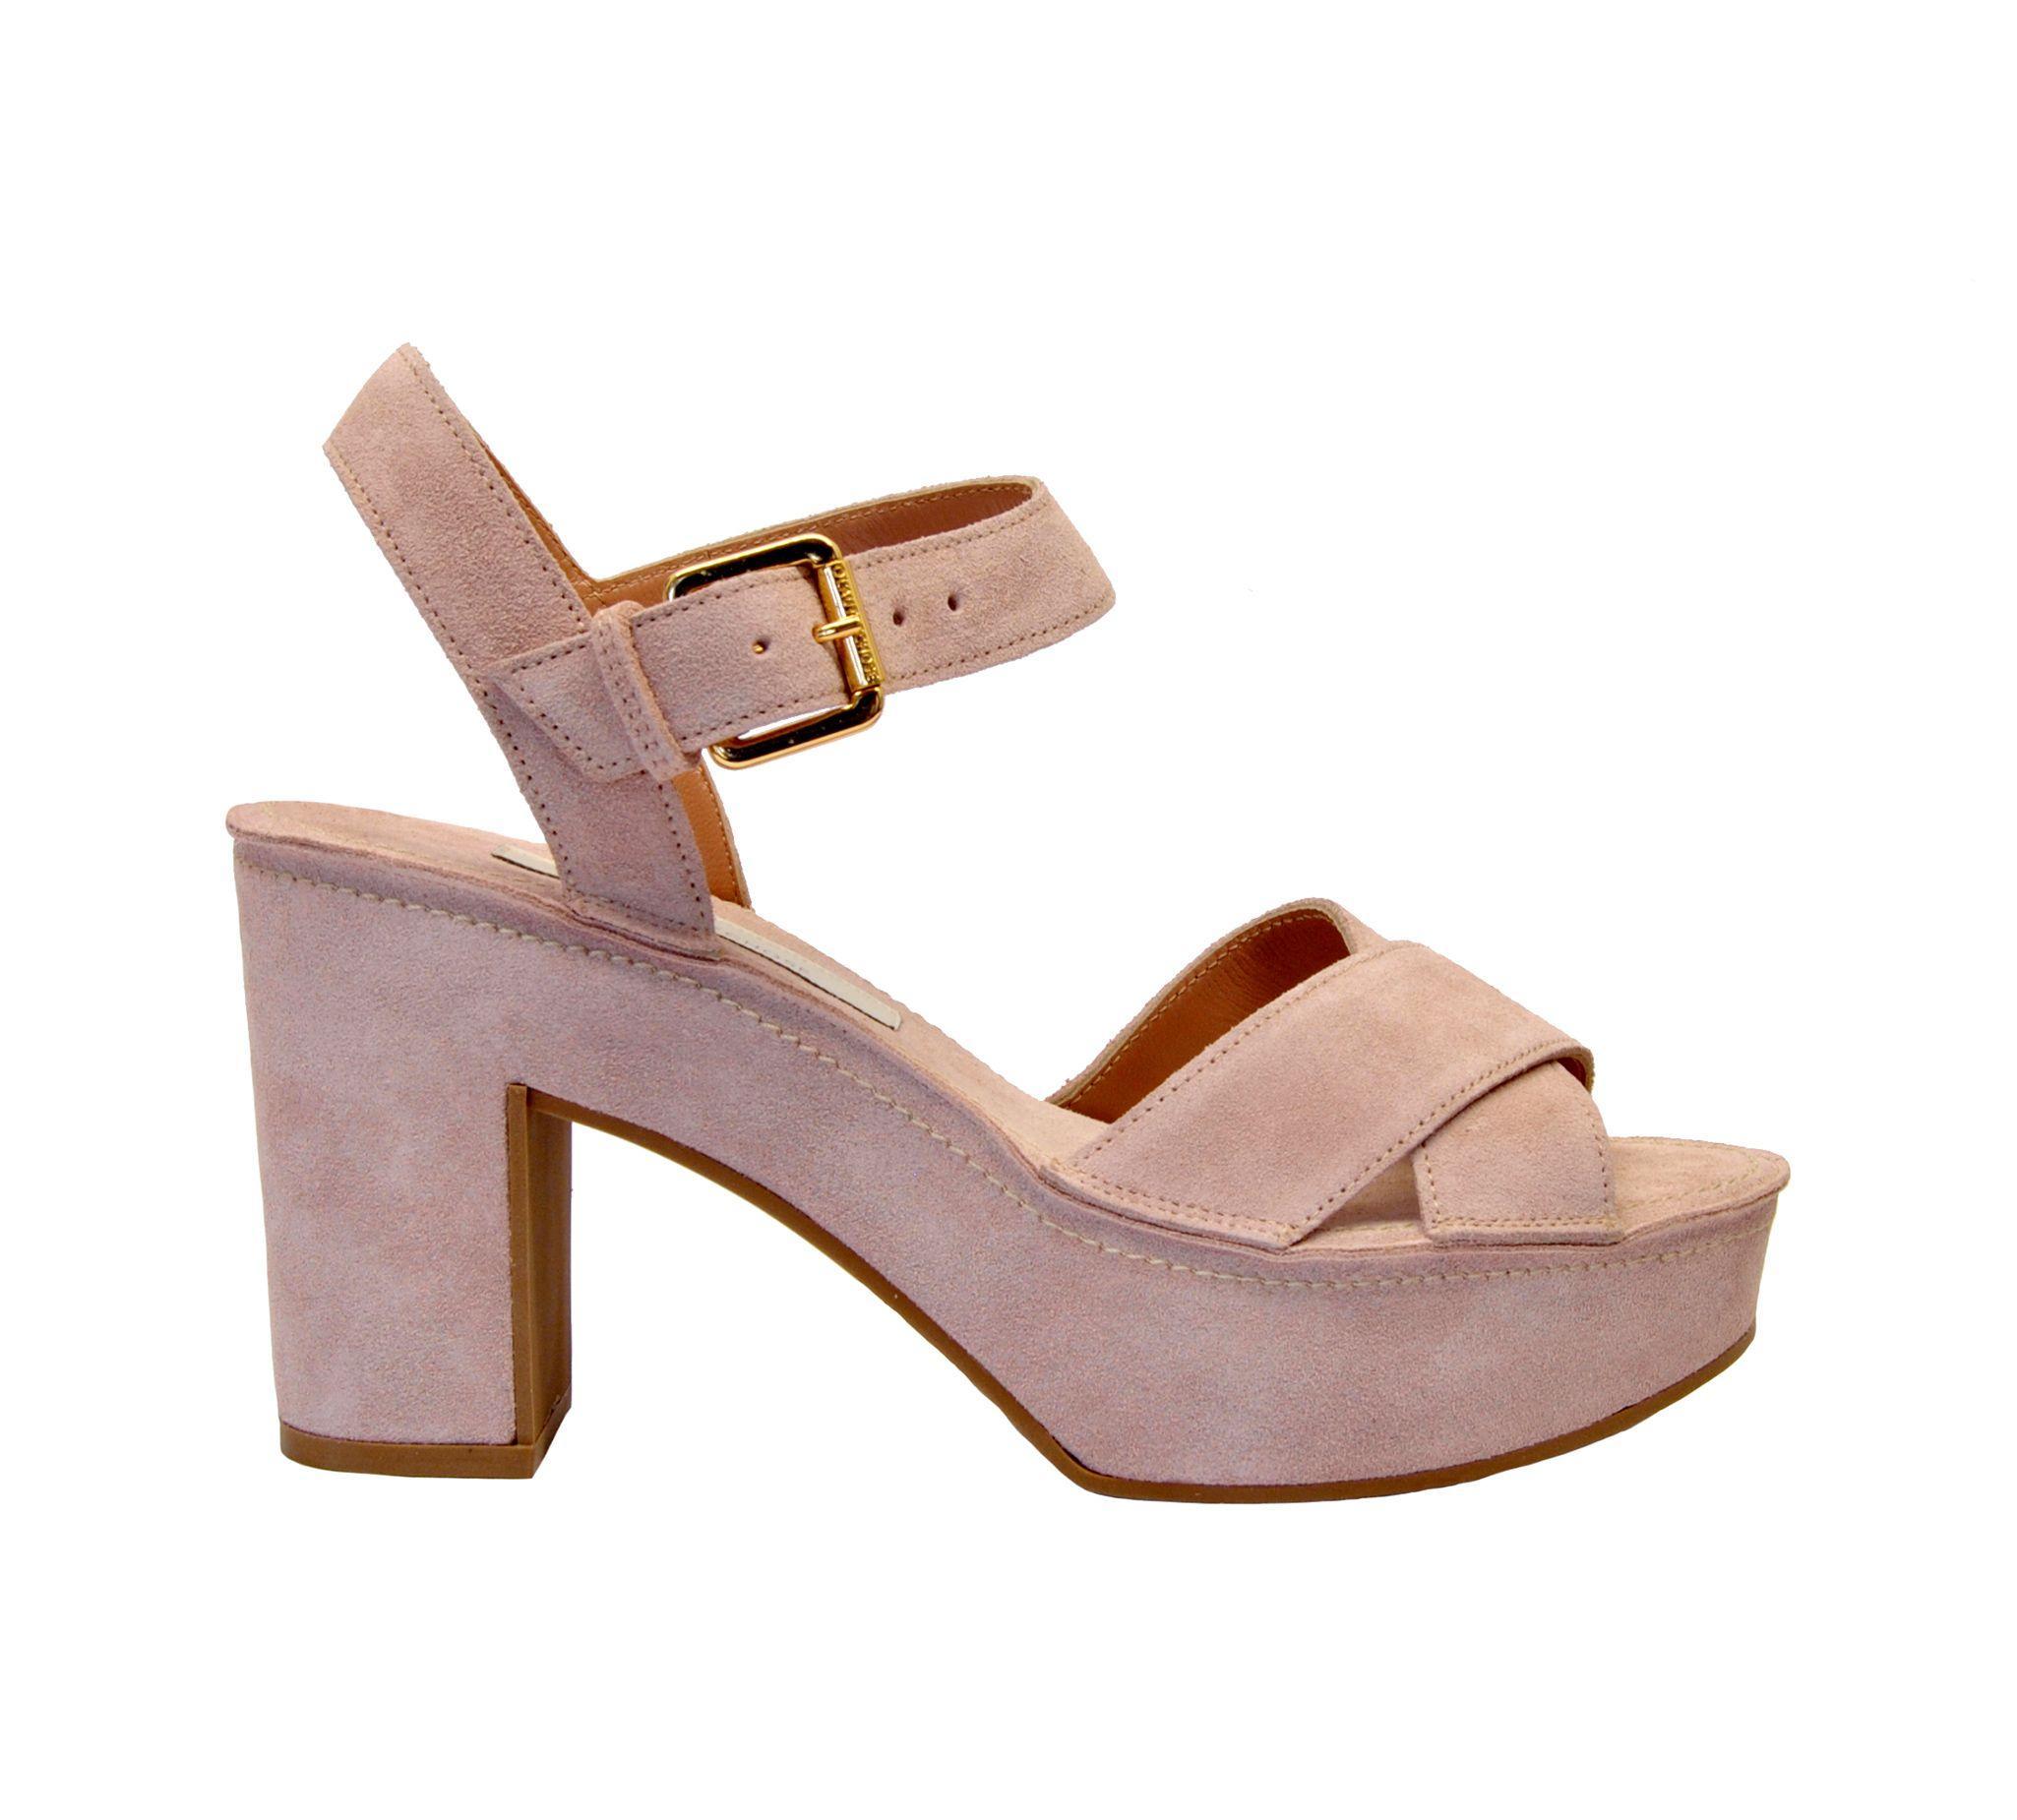 dcd226cd407 L'Autre Chose Pink Suede Sandals in Pink - Lyst